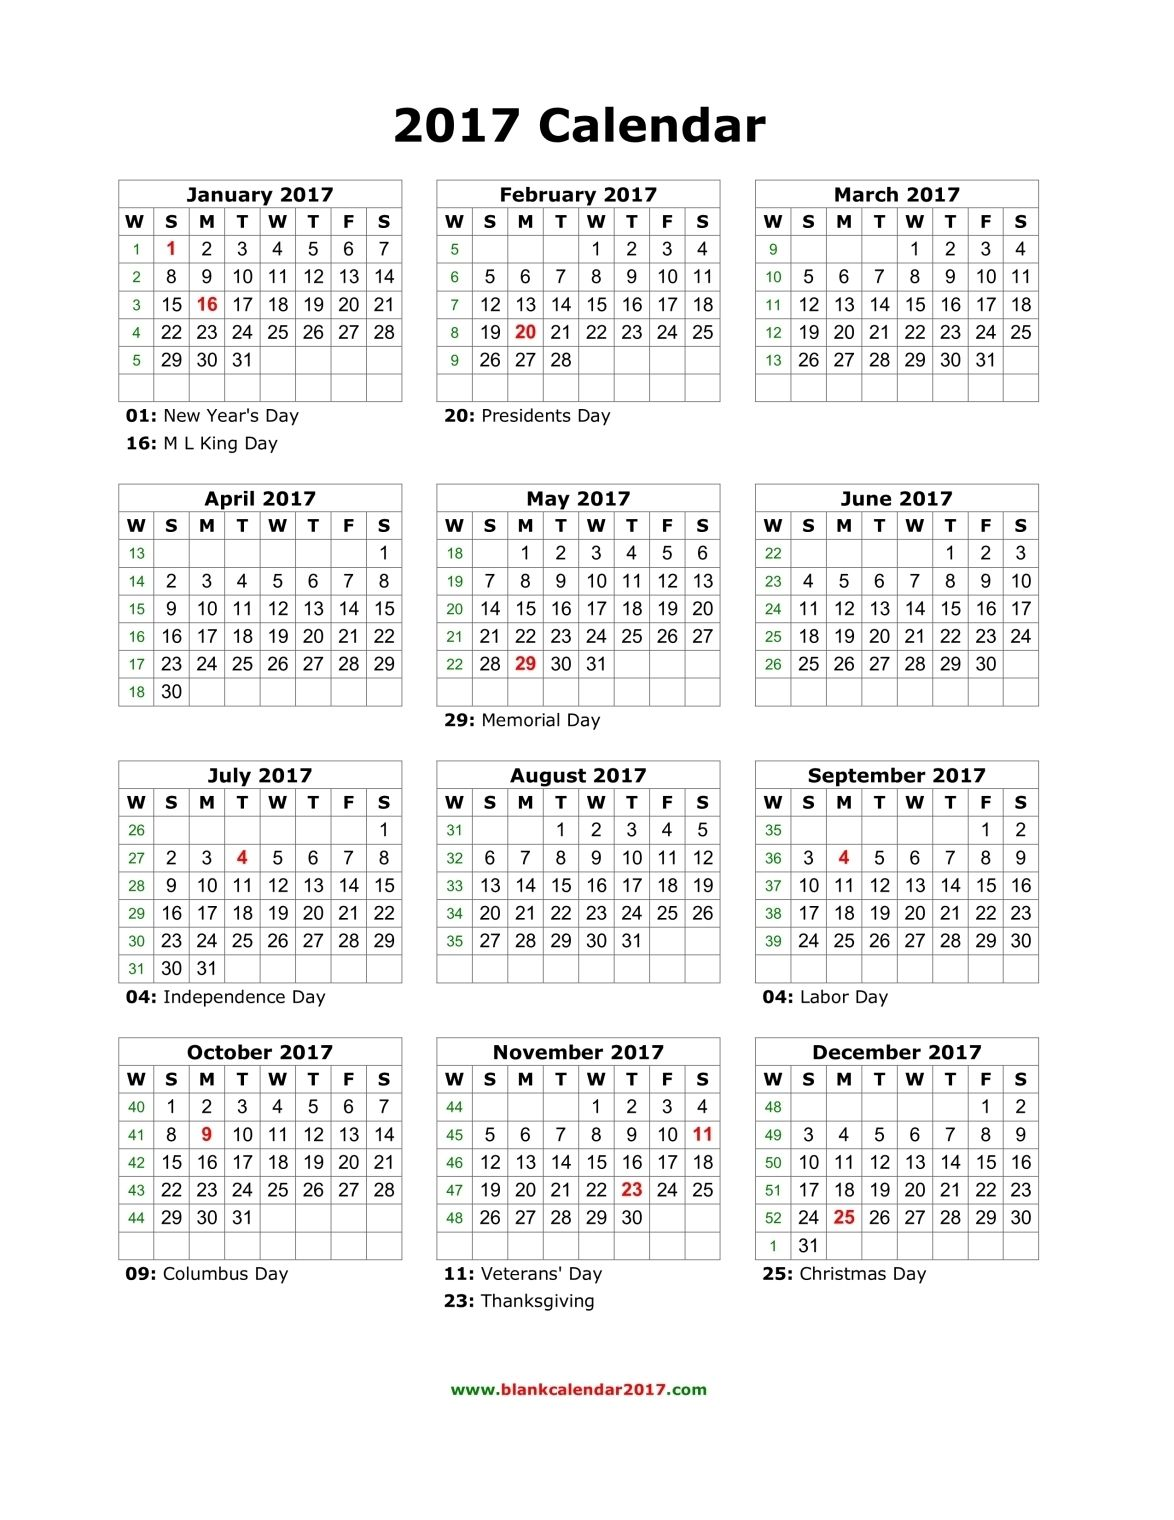 Blank Holidays Calendar Portrait